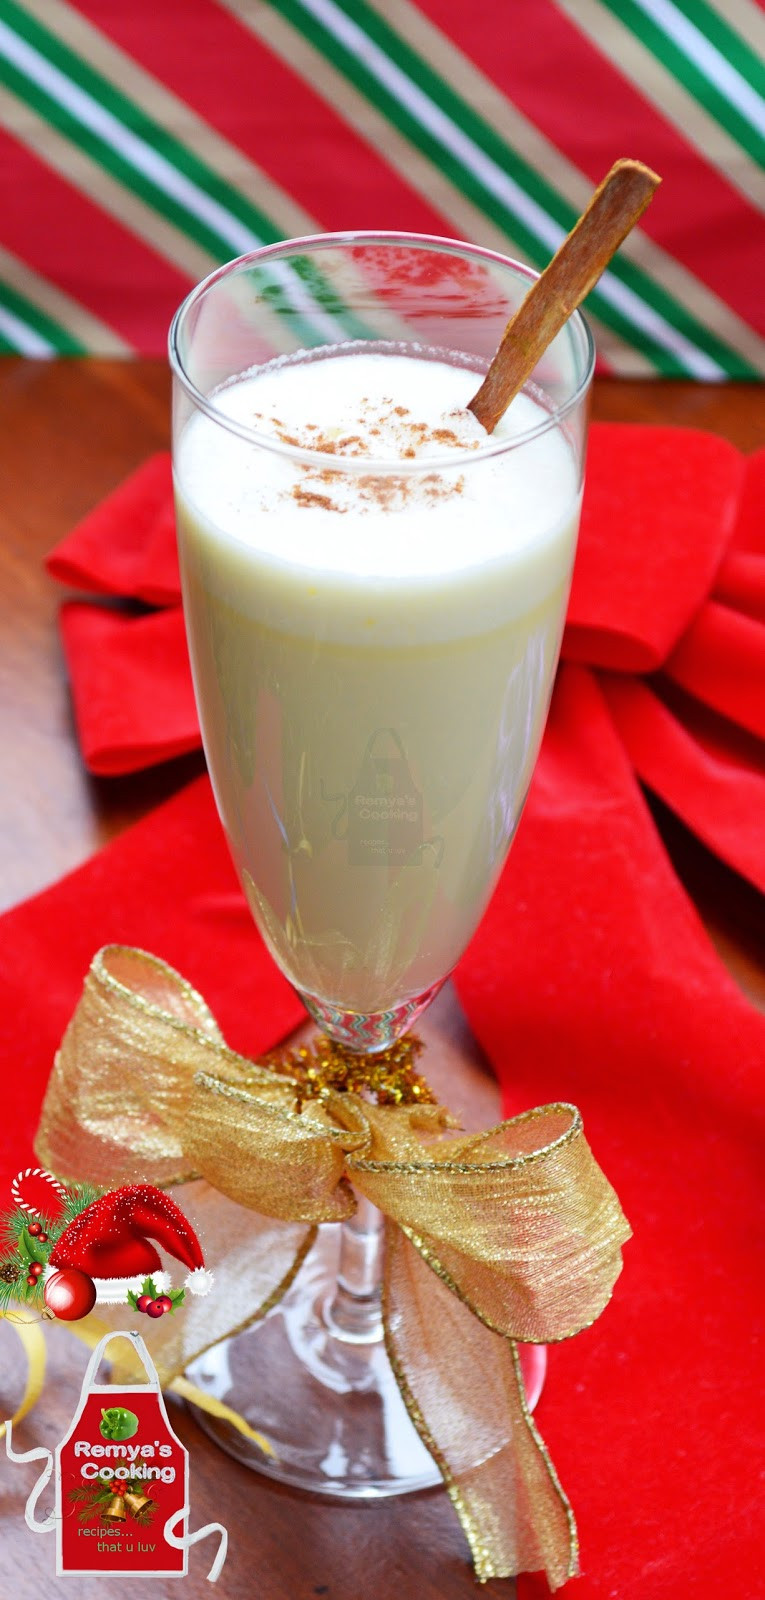 How To Drink Eggnog  Eggnog A traditional Christmas drink